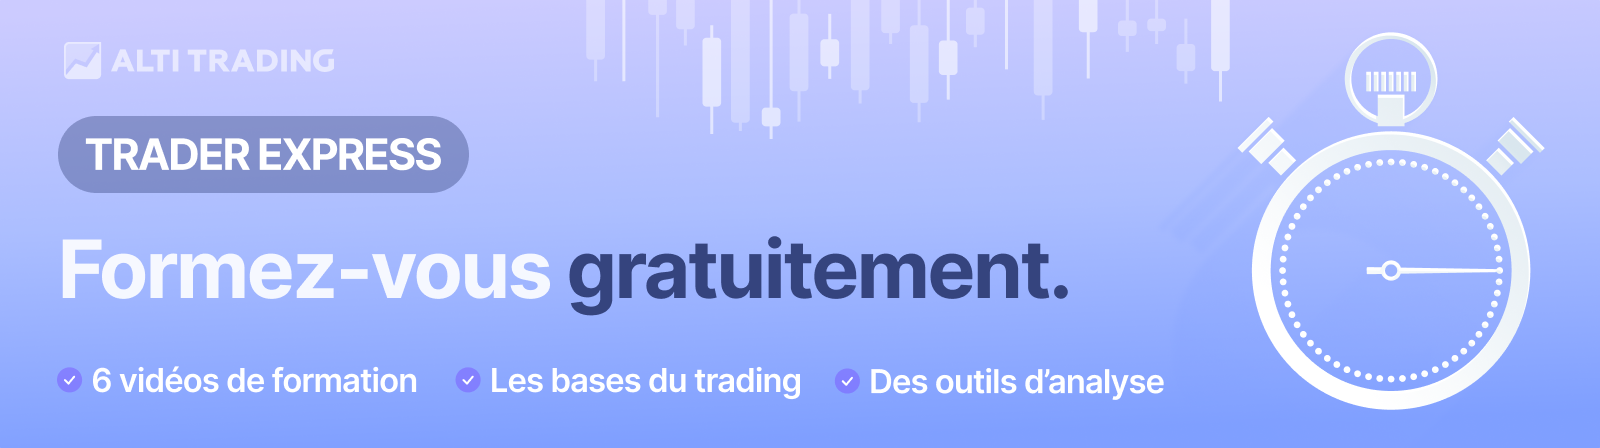 formation-gratuite-trading